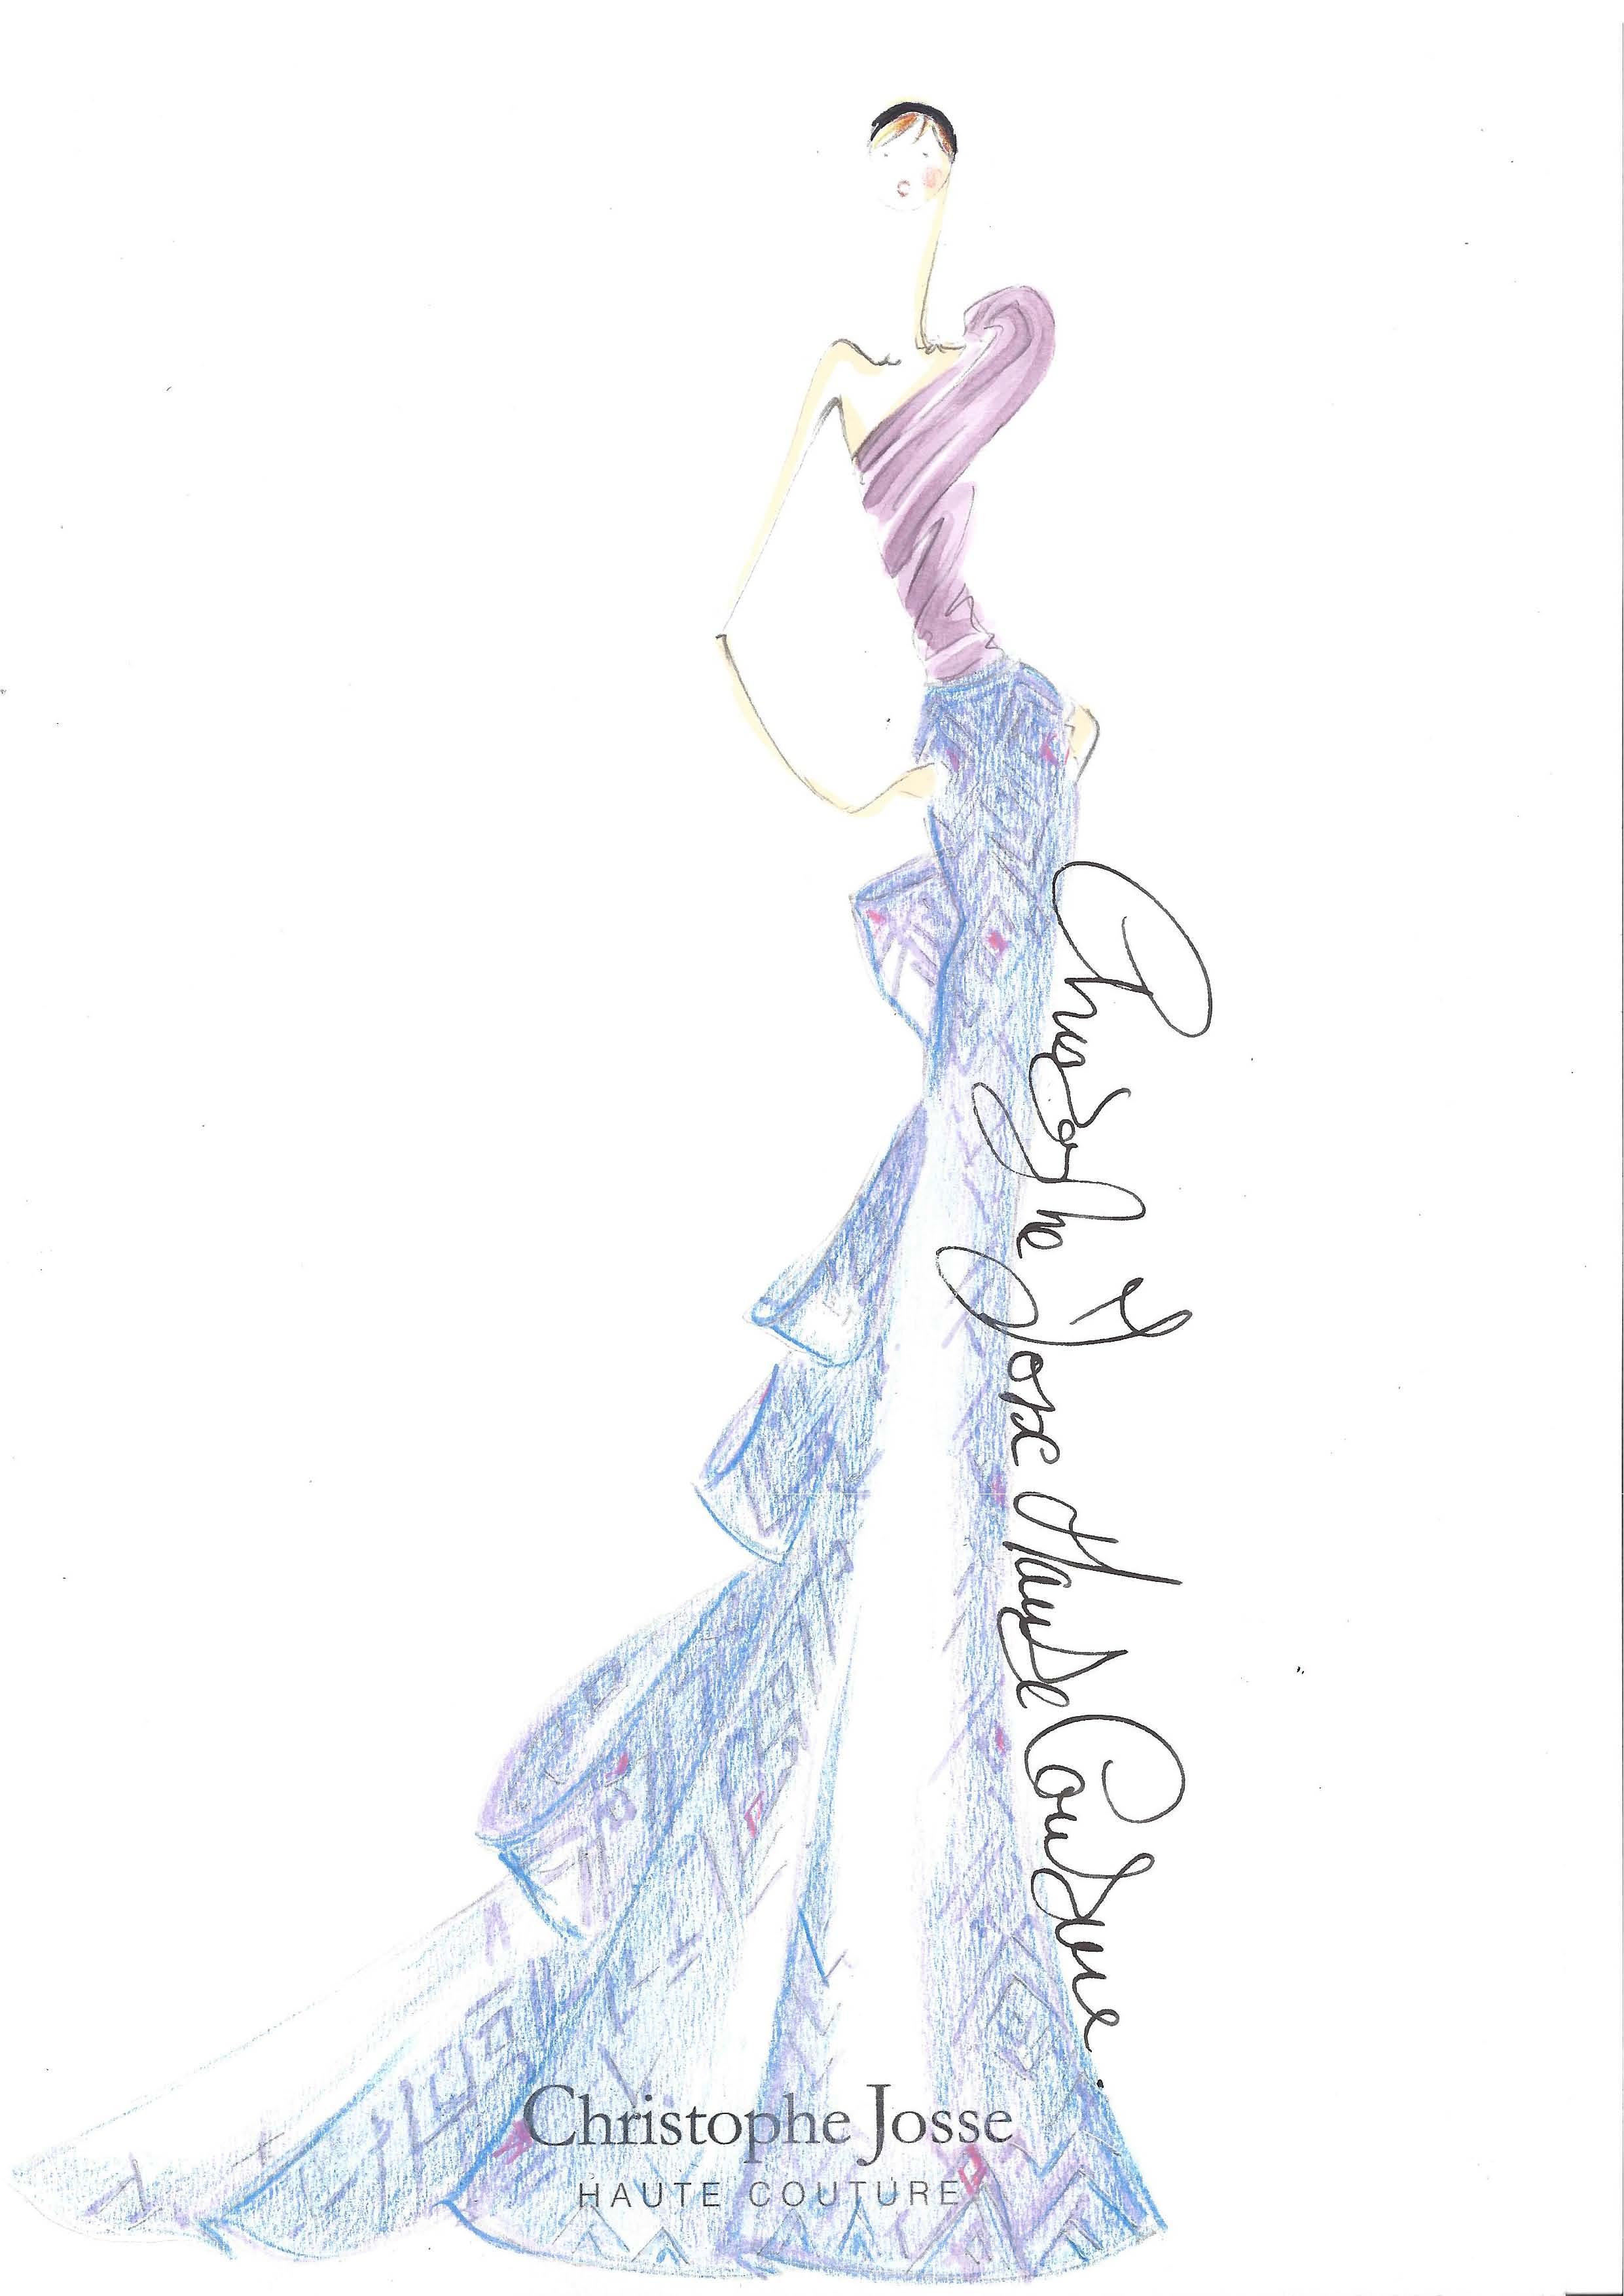 Couturenotebook+Christophe+Josse.jpg